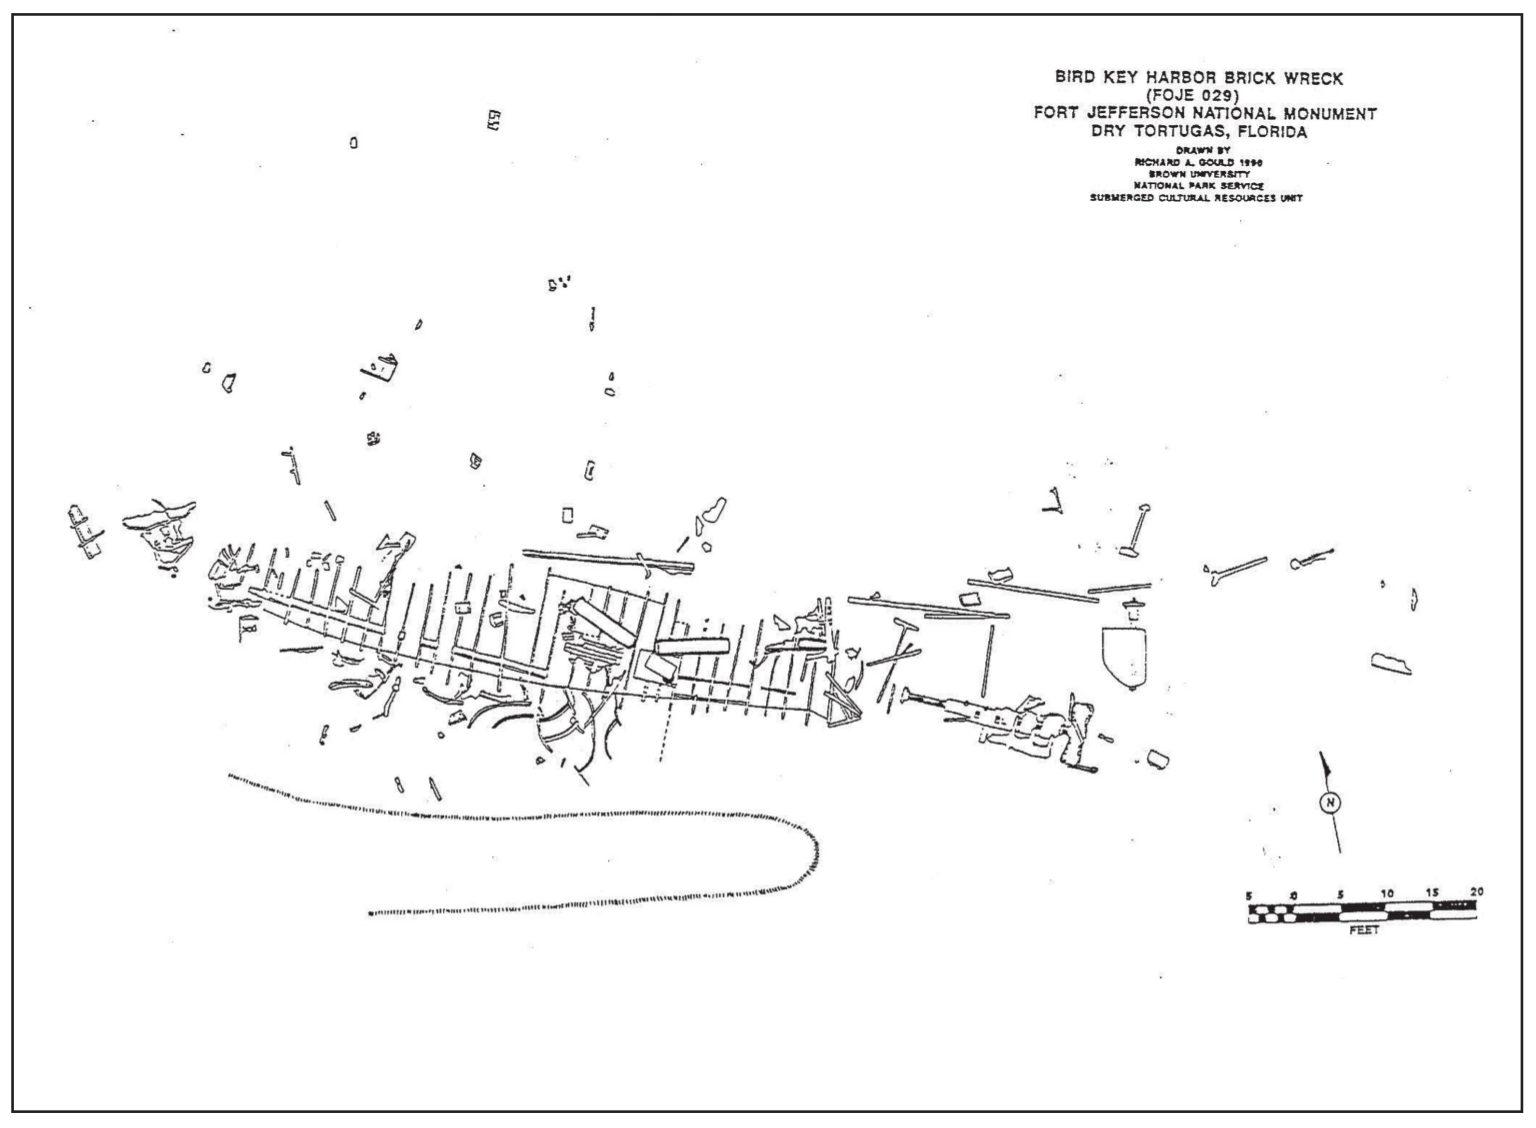 FileNPS drytortugasbirdkeywreckmapjpg Wikimedia Commons